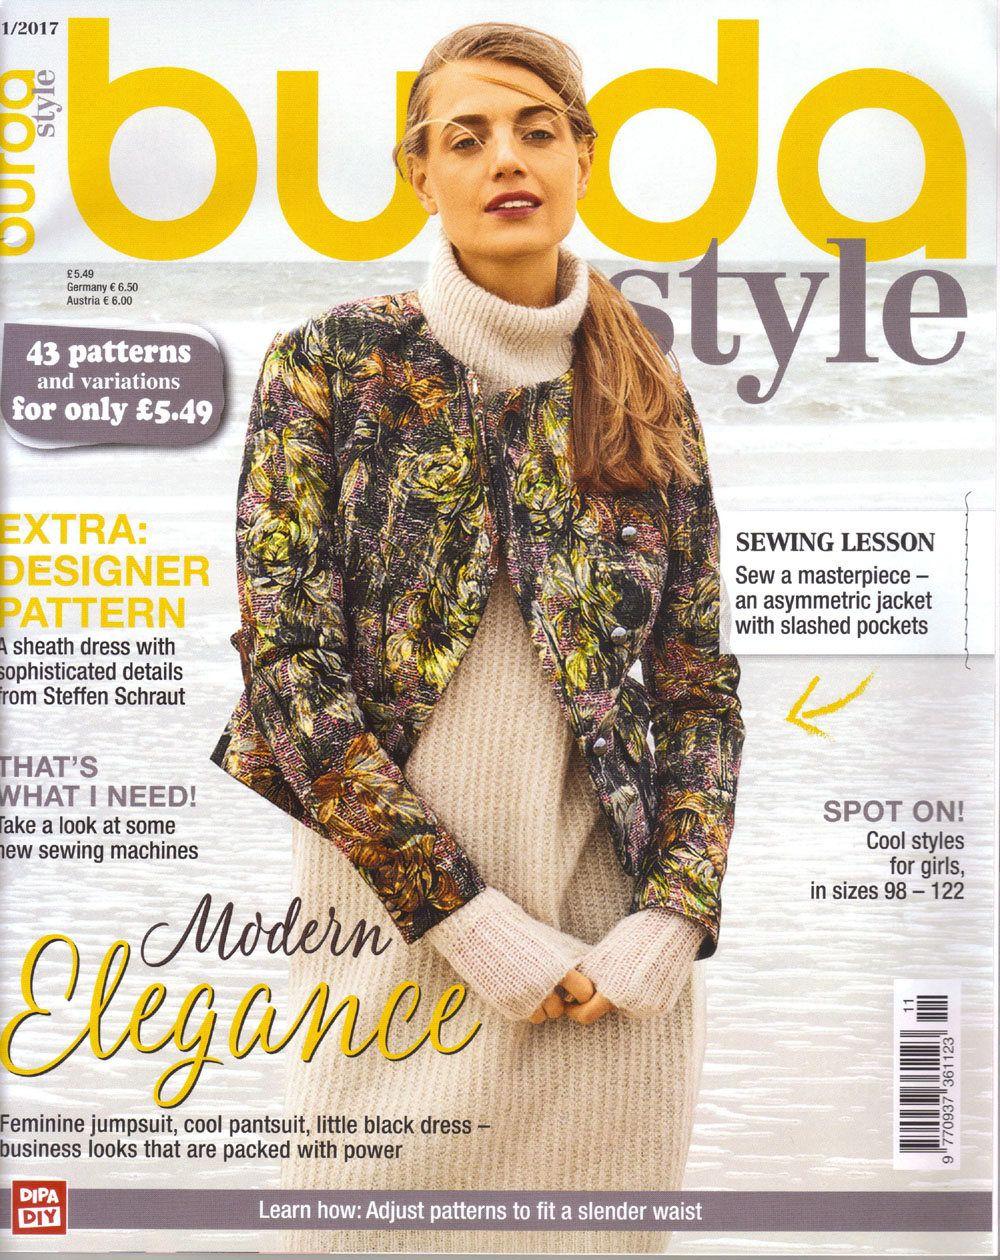 Burda style magazine 112017 english sewing patterns by burda style magazine 112017 english sewing patterns by honeyjamsuniques on etsy jeuxipadfo Image collections